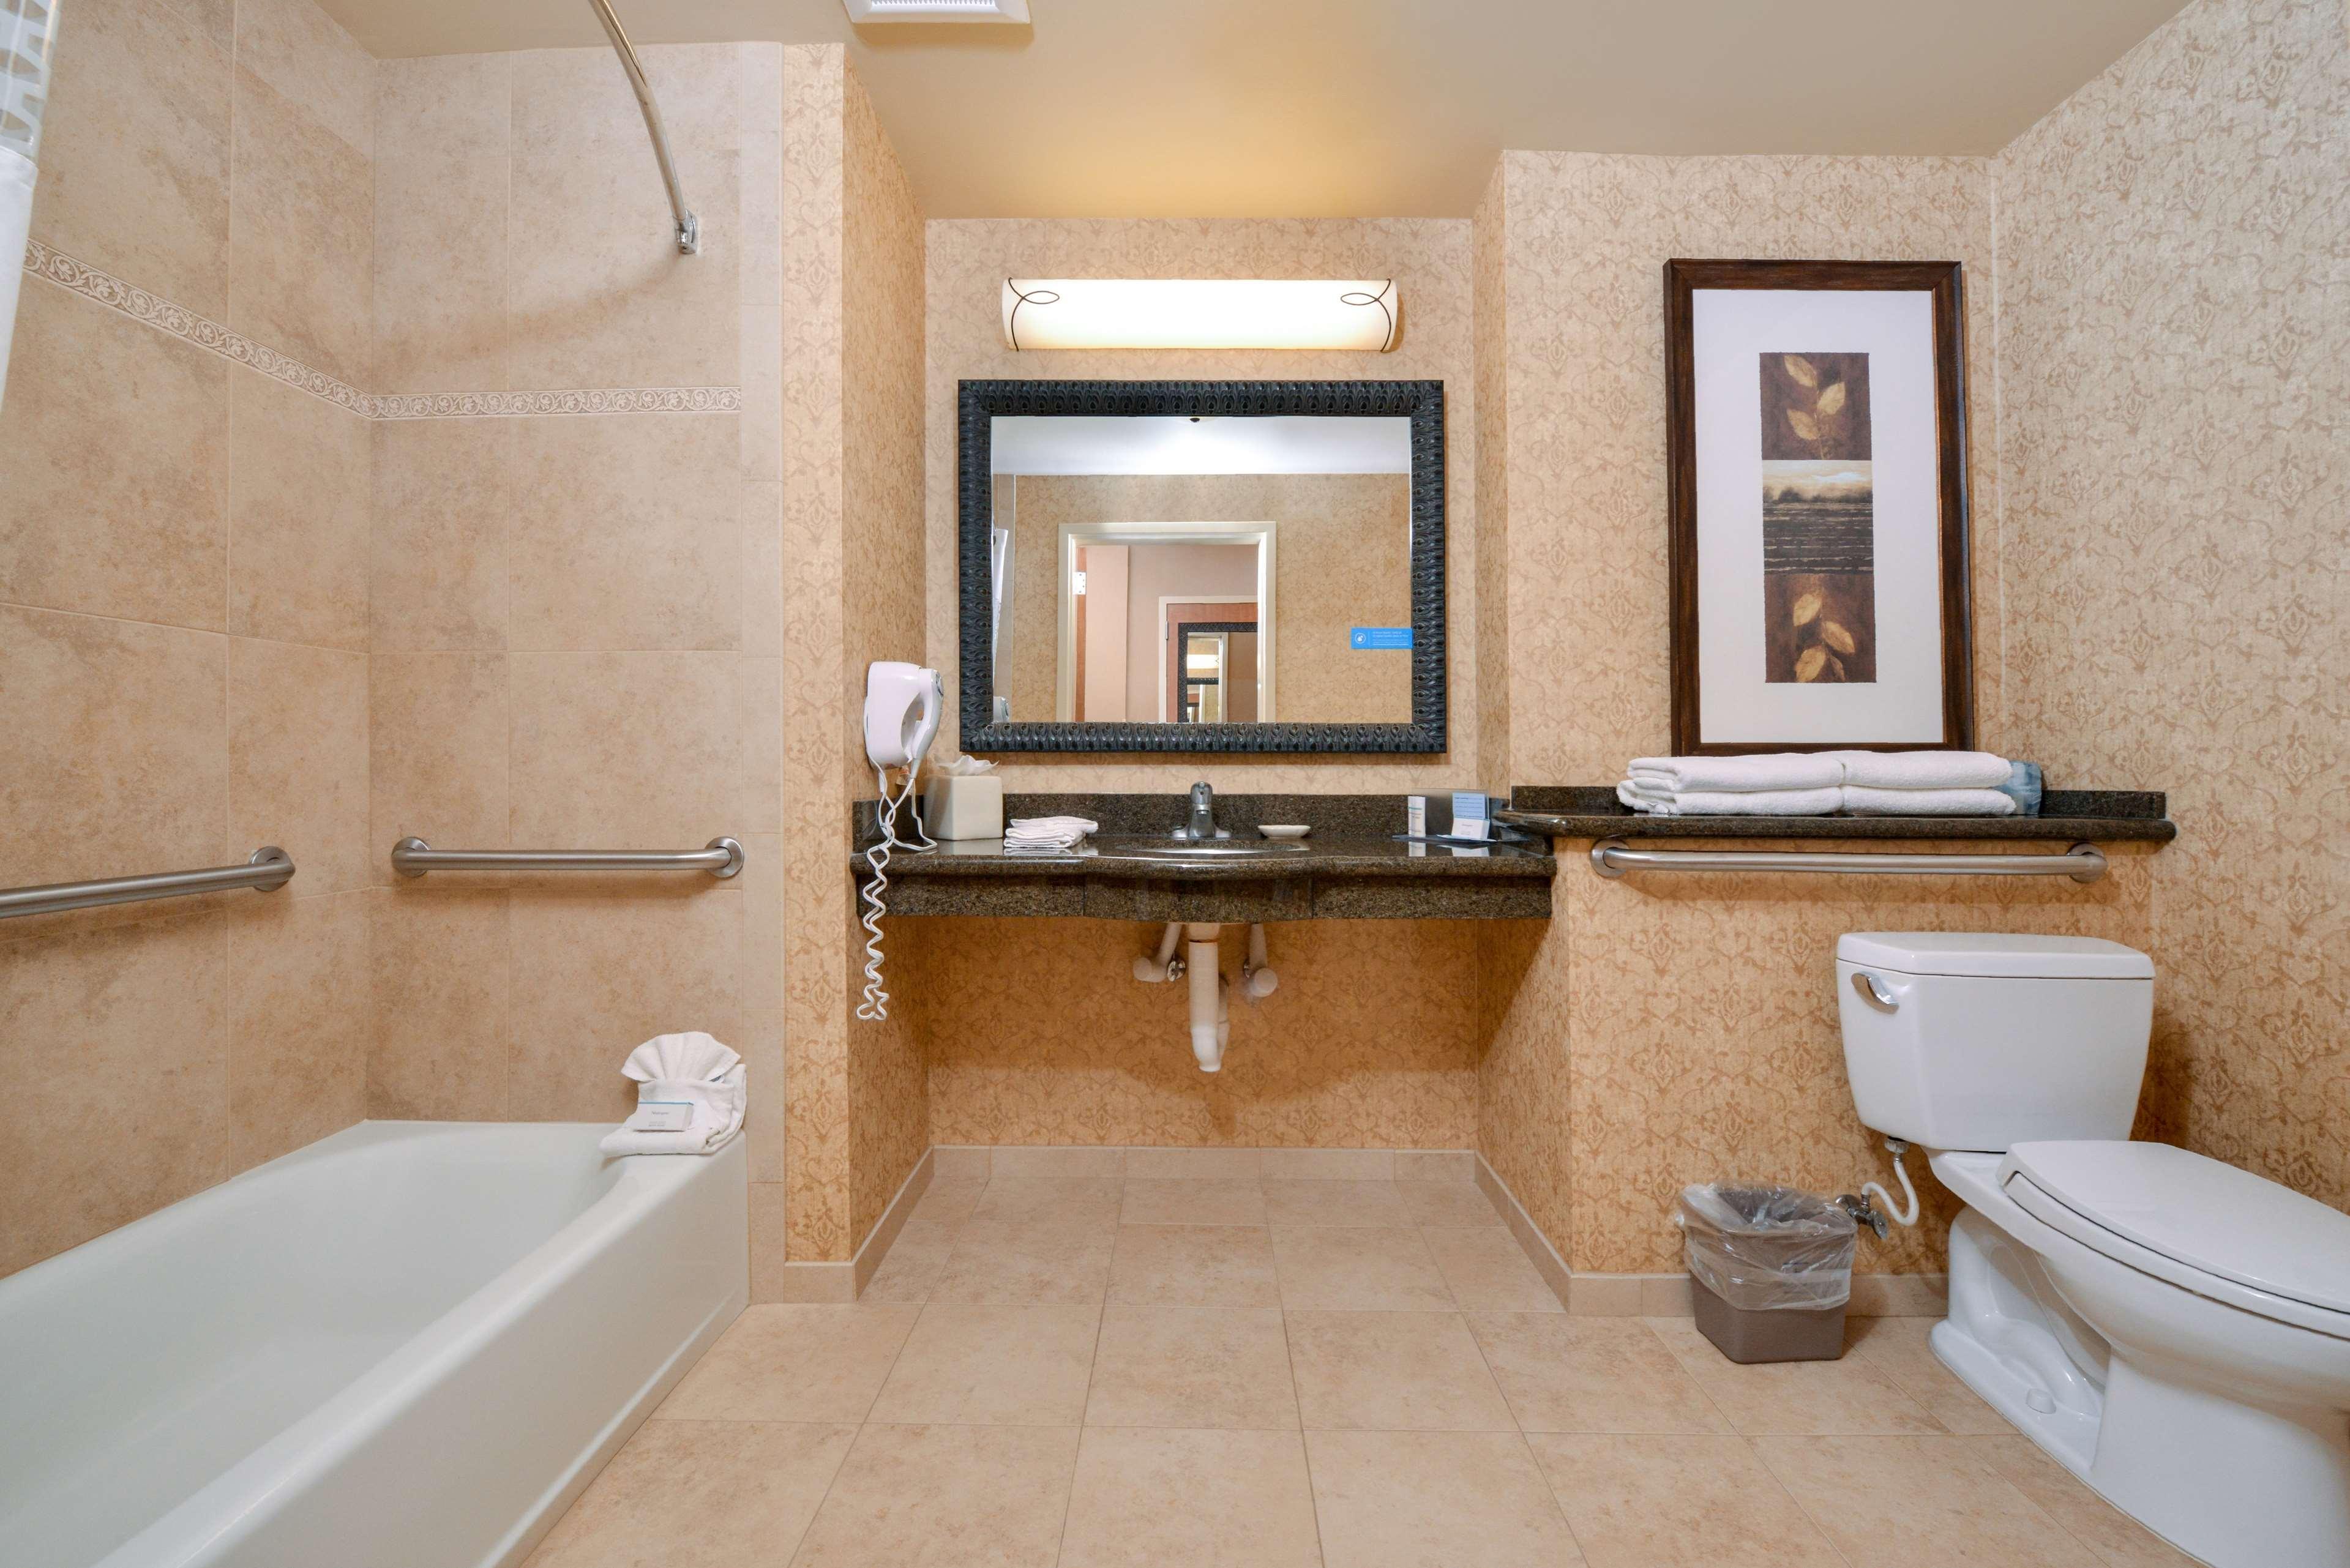 Hampton Inn & Suites Coeur d' Alene image 18